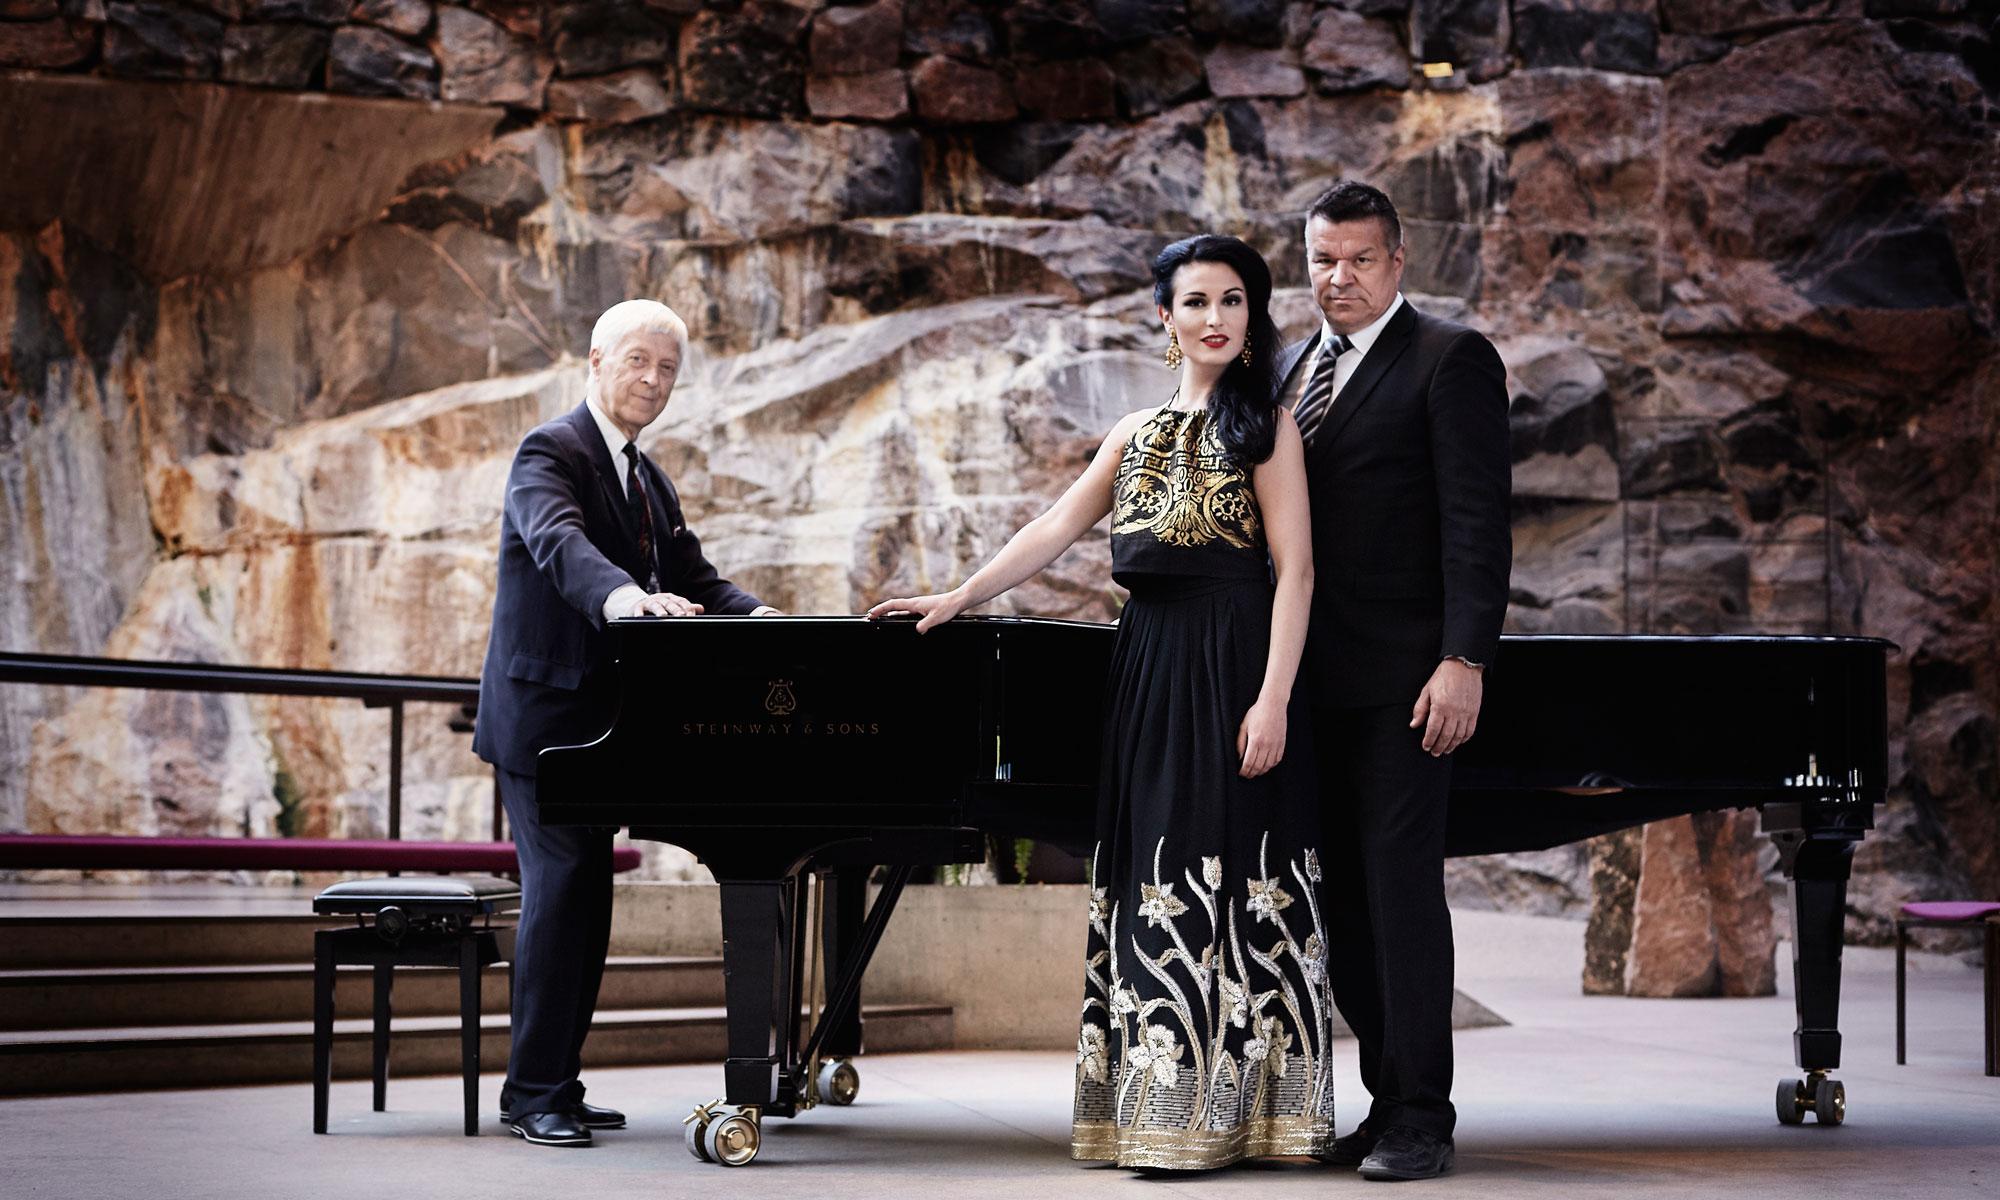 Johannes Kastaja oratorio Sarmanto Lund Mäkinen